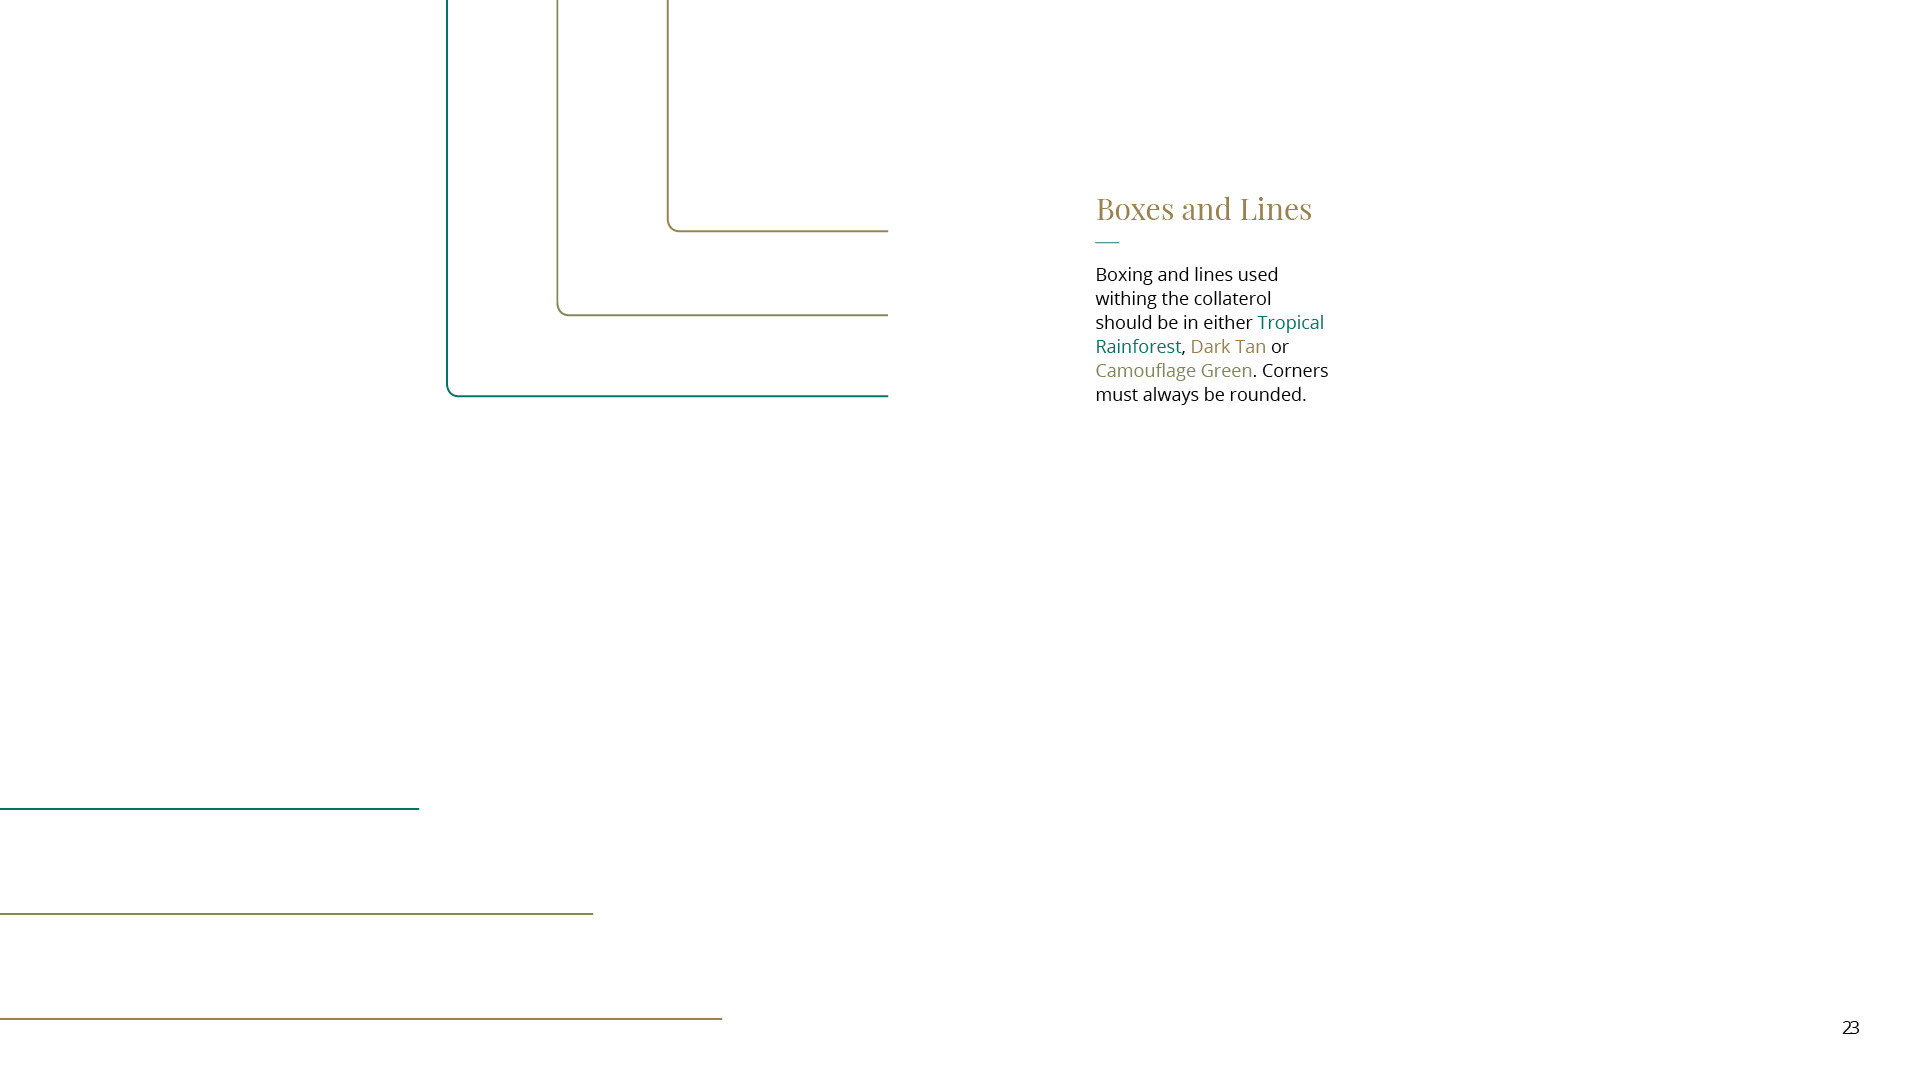 Brand Visual Identity24.jpg